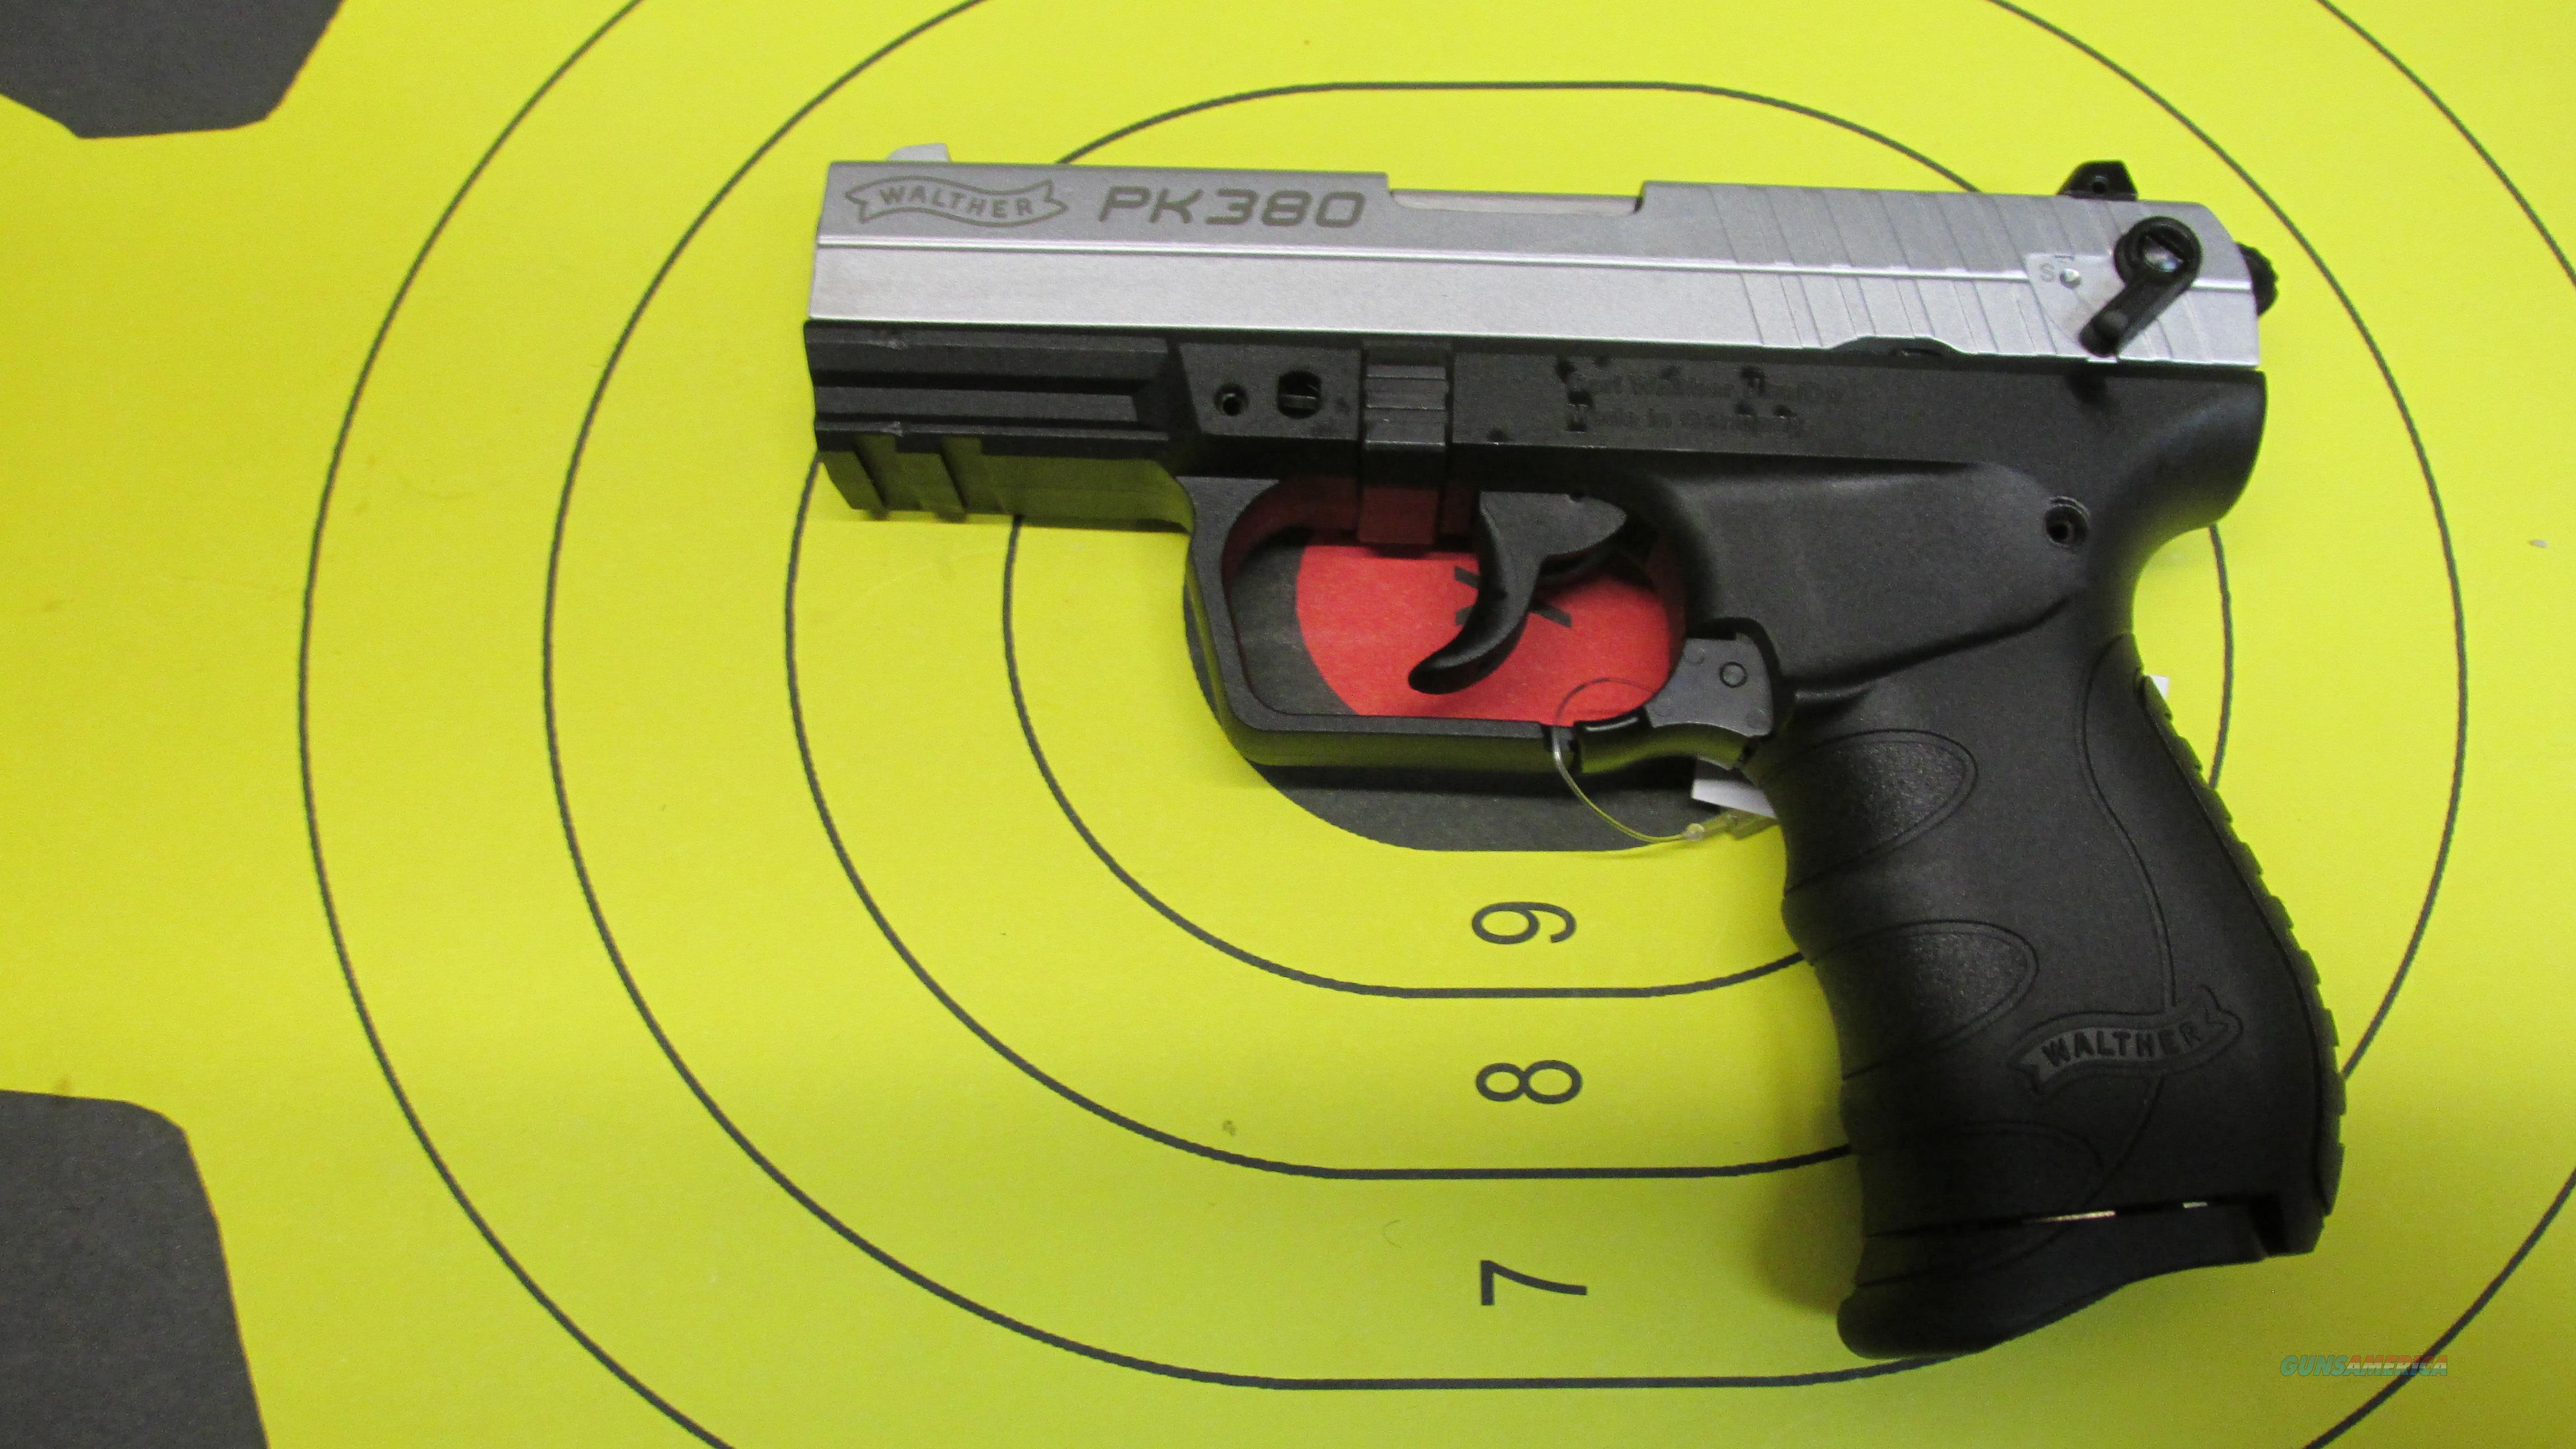 "WALTHER PK380 BI-TONE .380ACP PISTOL 7 ROUND MAGAZINE WITH A 3.66"" BARREL  Guns > Pistols > Walther Pistols > Post WWII > PK380"